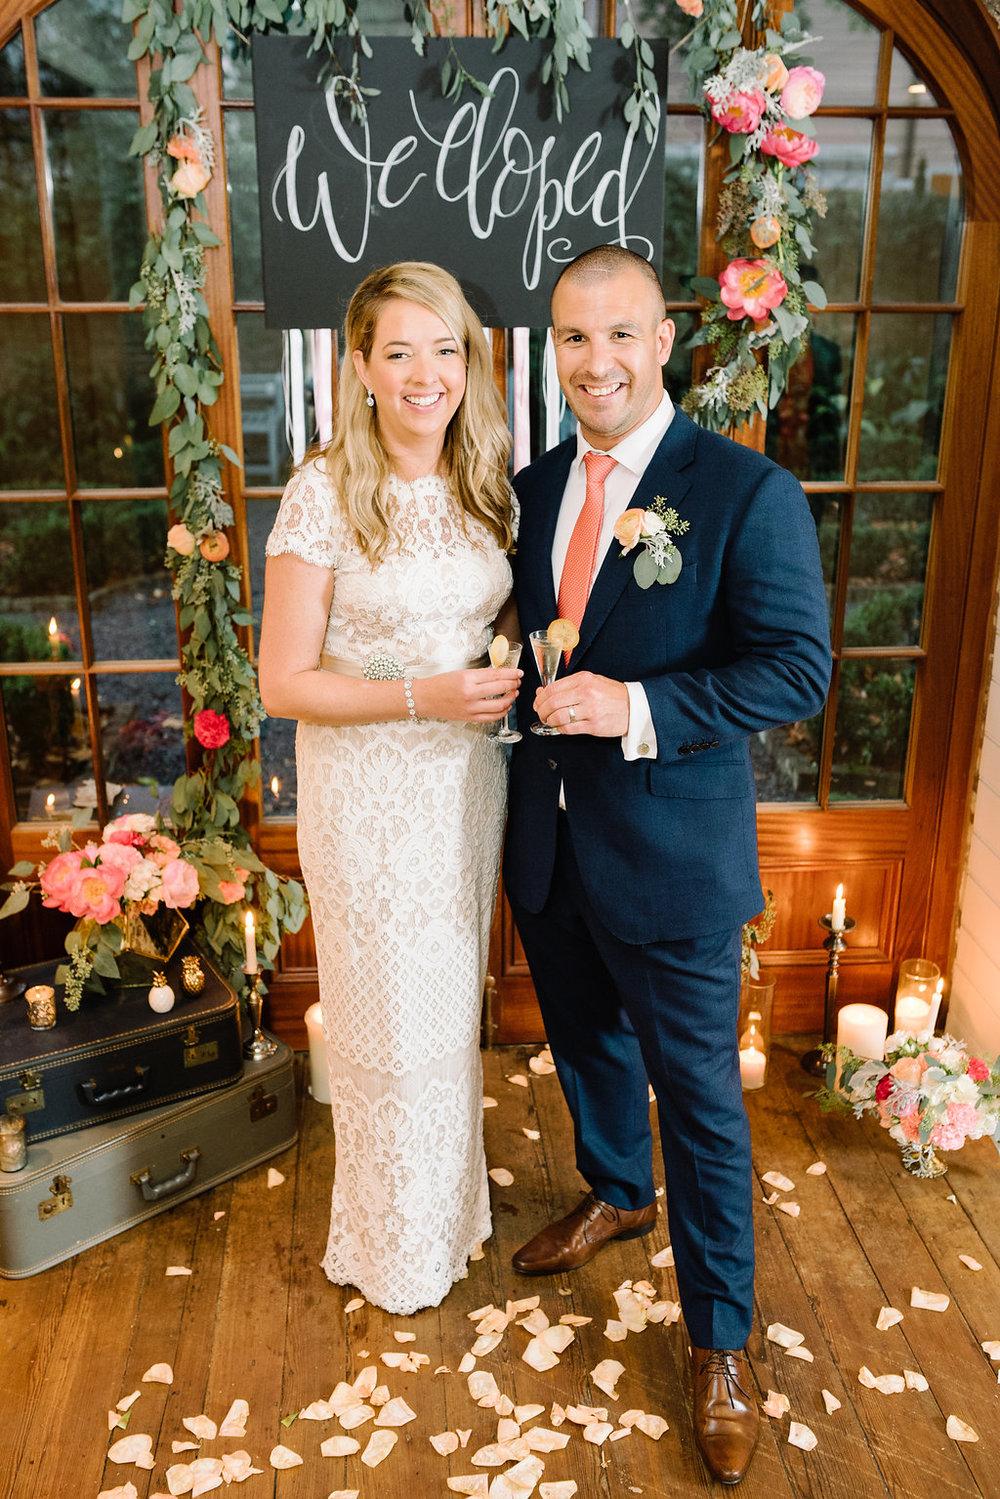 charleston elopement planners, scarlet plan & design, coral, tangerine, hot pink, peach intimate wedding  (11).jpg